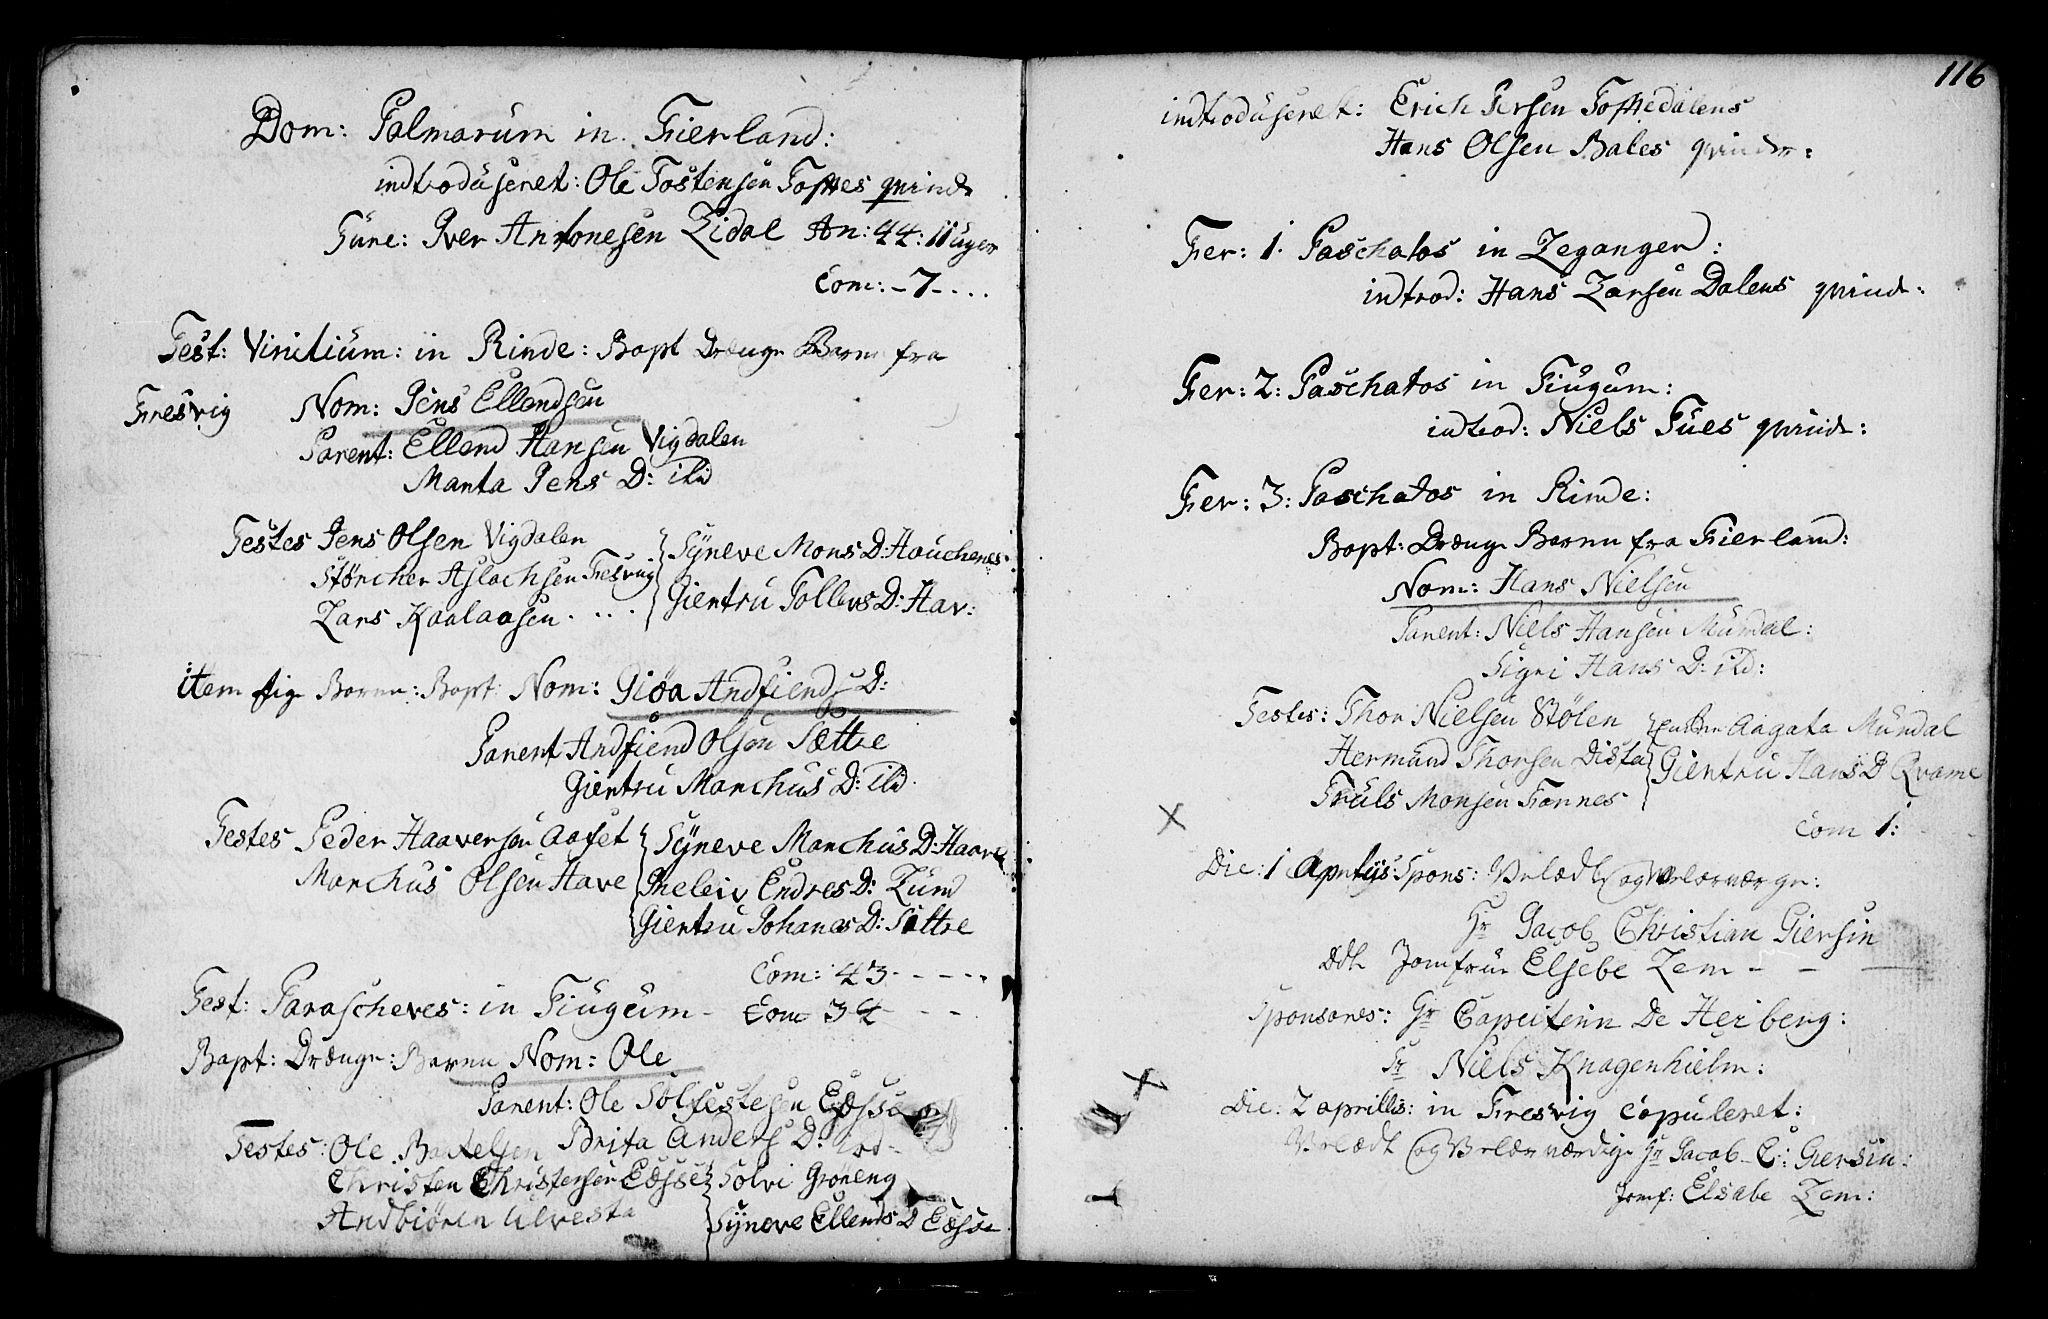 SAB, Leikanger sokneprestembete, Ministerialbok nr. A 3, 1756-1770, s. 116